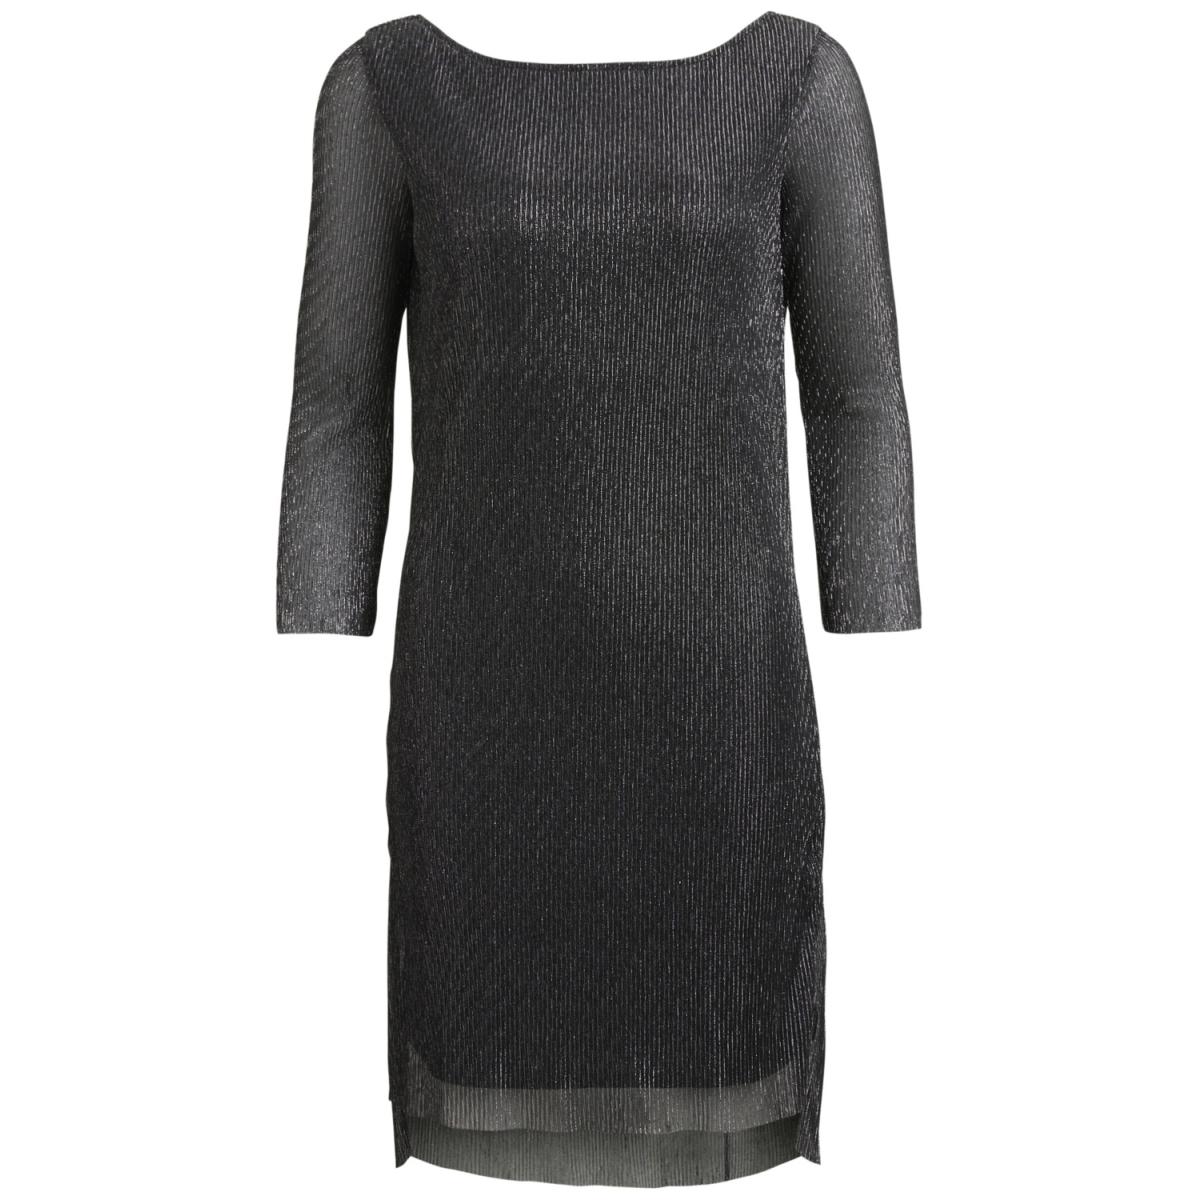 objshimmer 3/4 abk dress apb 23026449 object jurk black